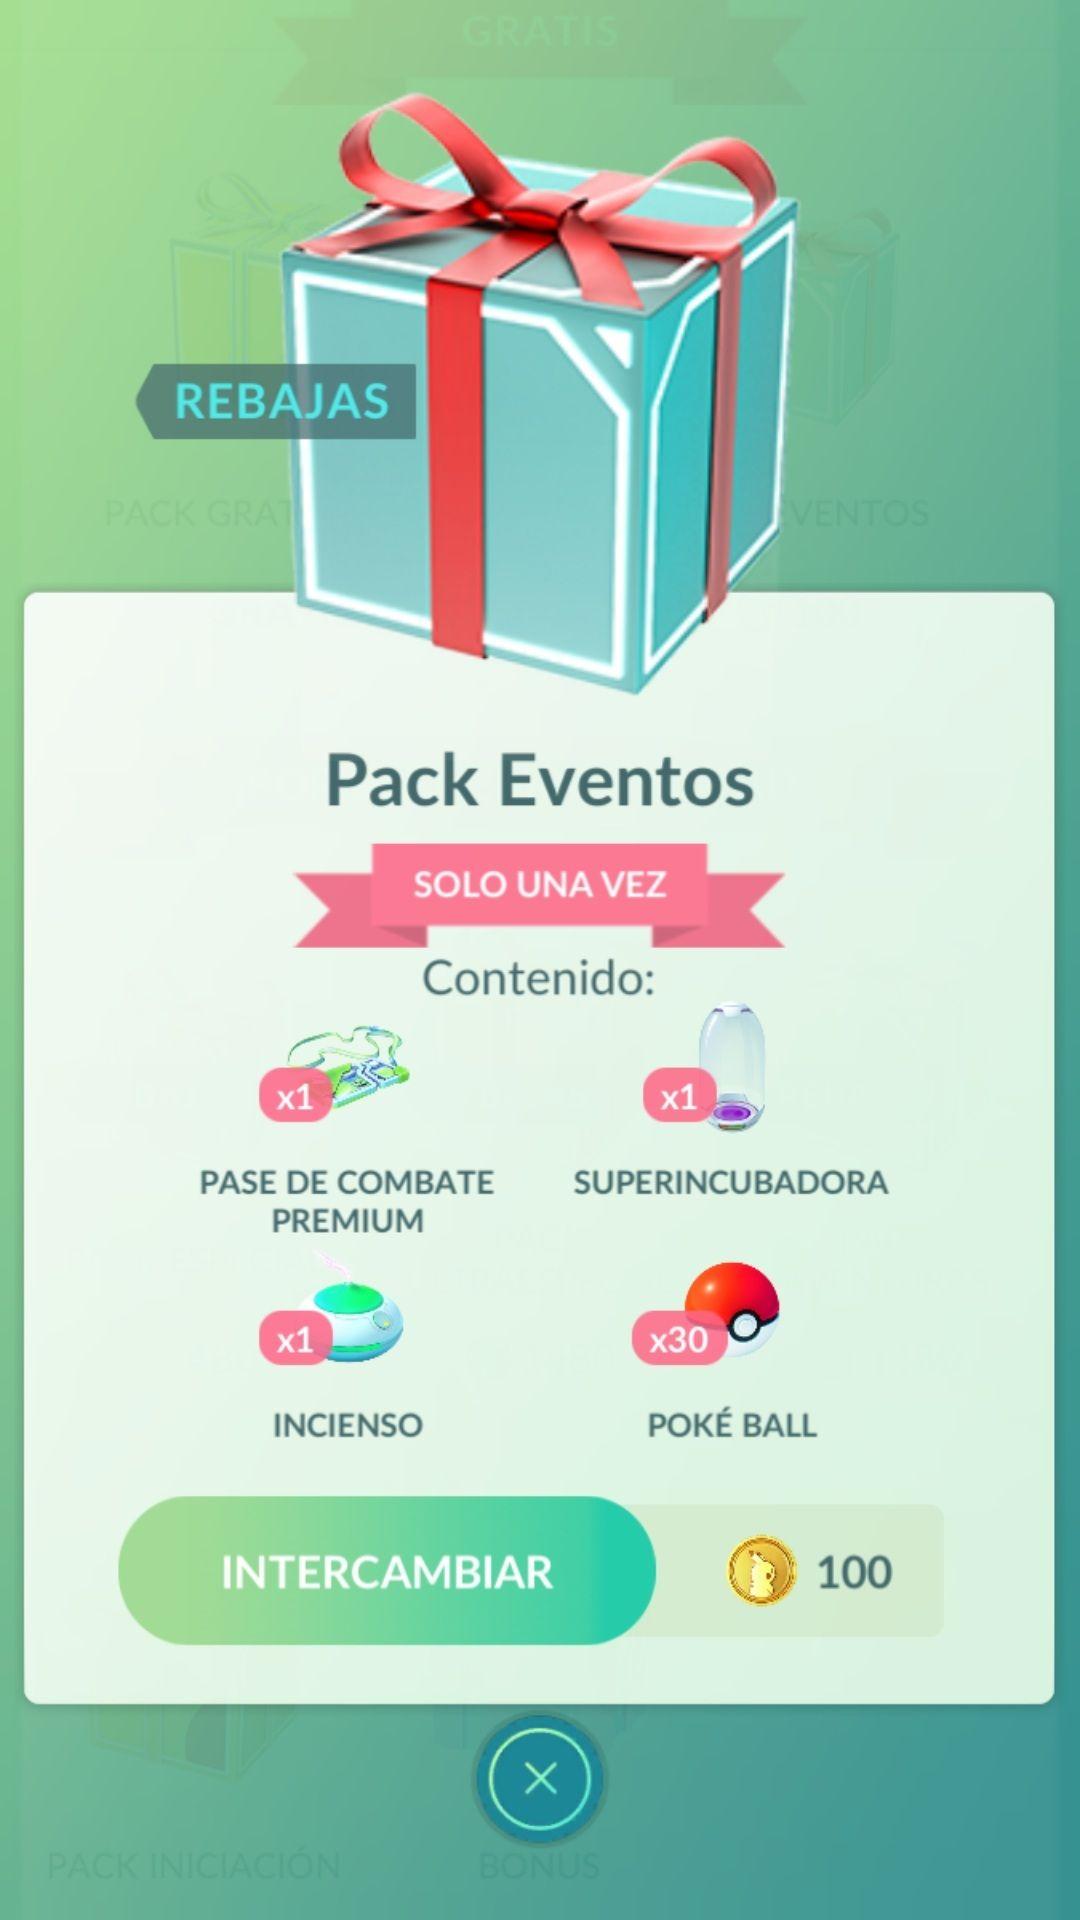 Pokémon: Pack de eventos exclusivo en India por 100 pokemonedas